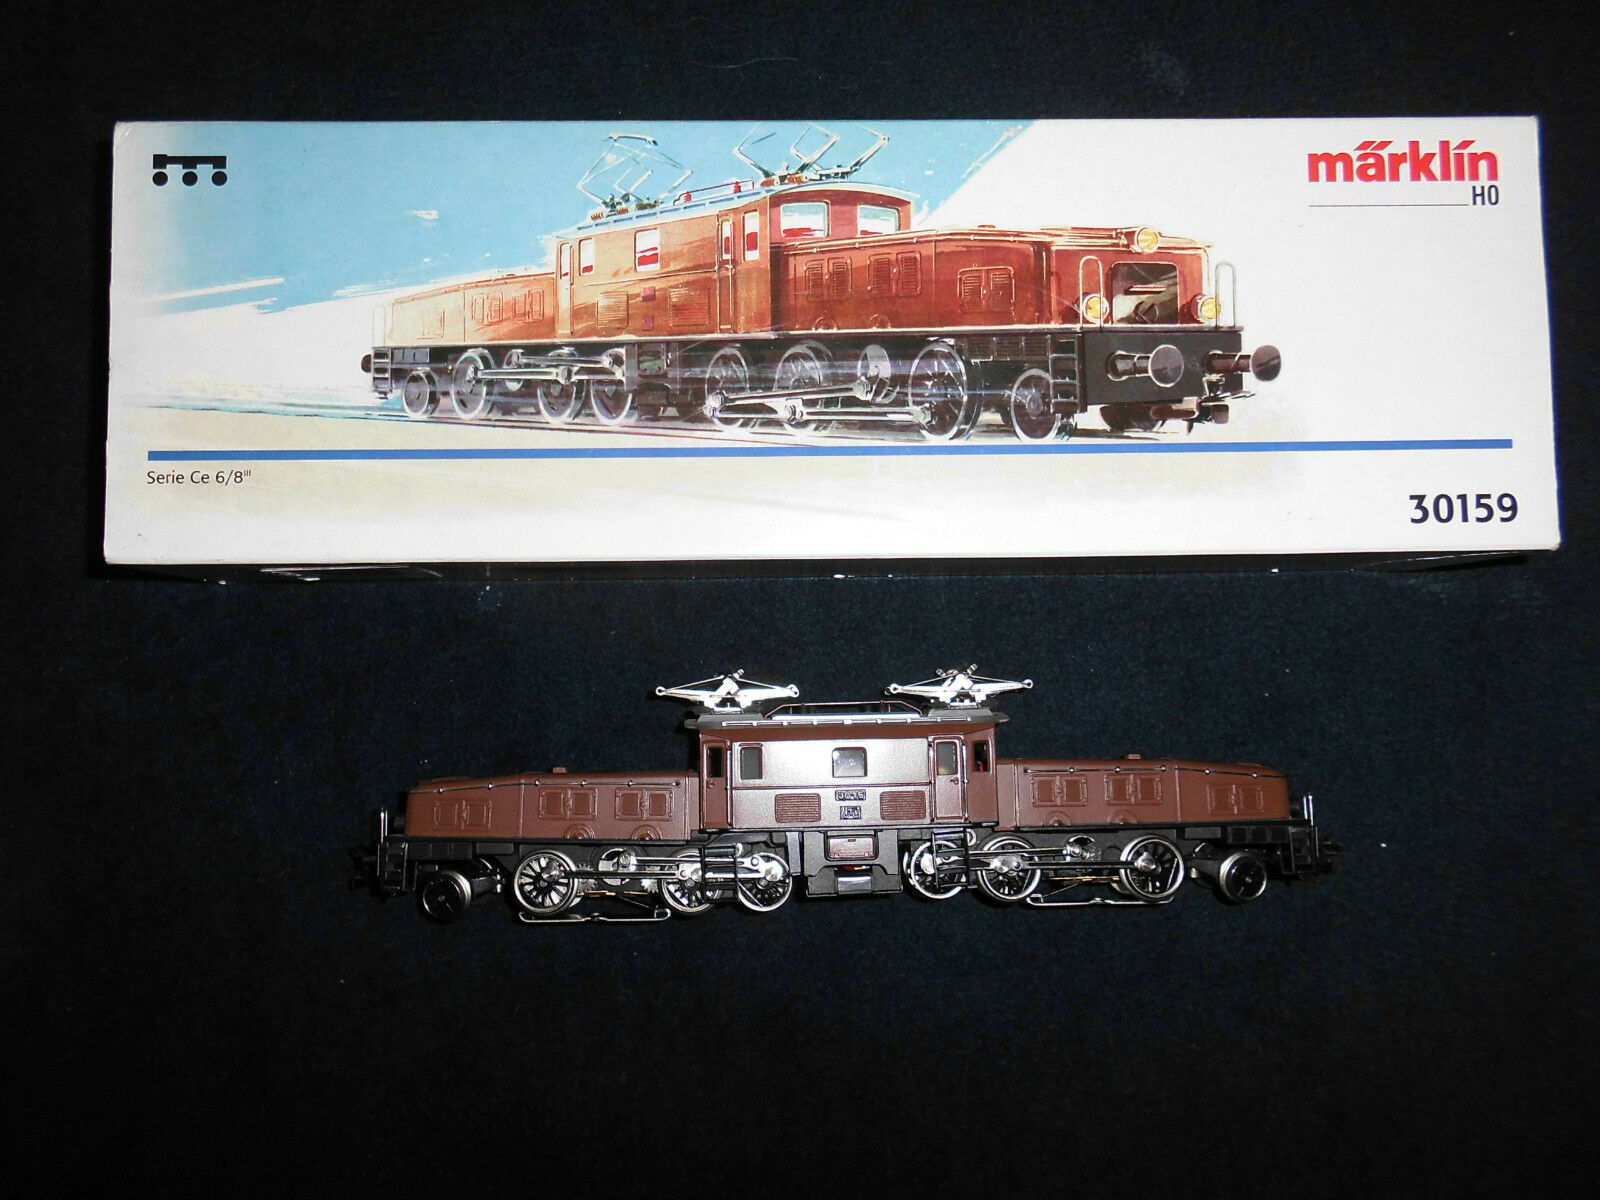 Marklin H0 - 30159 Krokodile Serie CE 6 8 brown - OVP